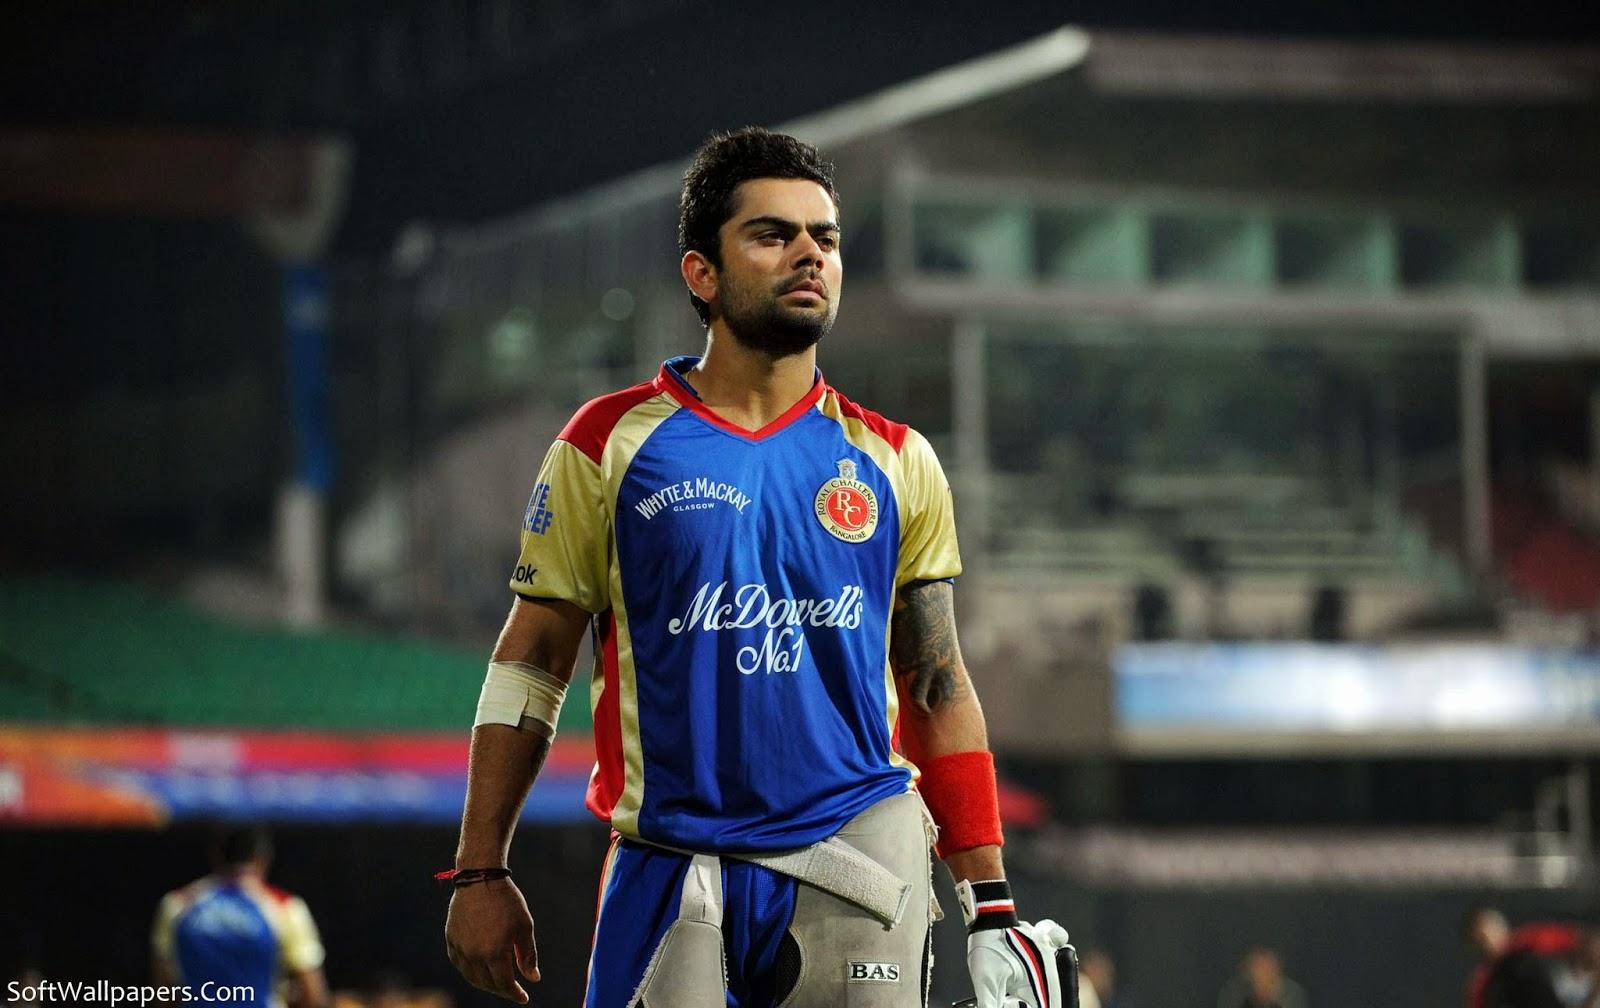 Hd wallpaper cricket - Virat Kohli Indian Cricketer Hd Wallpapers